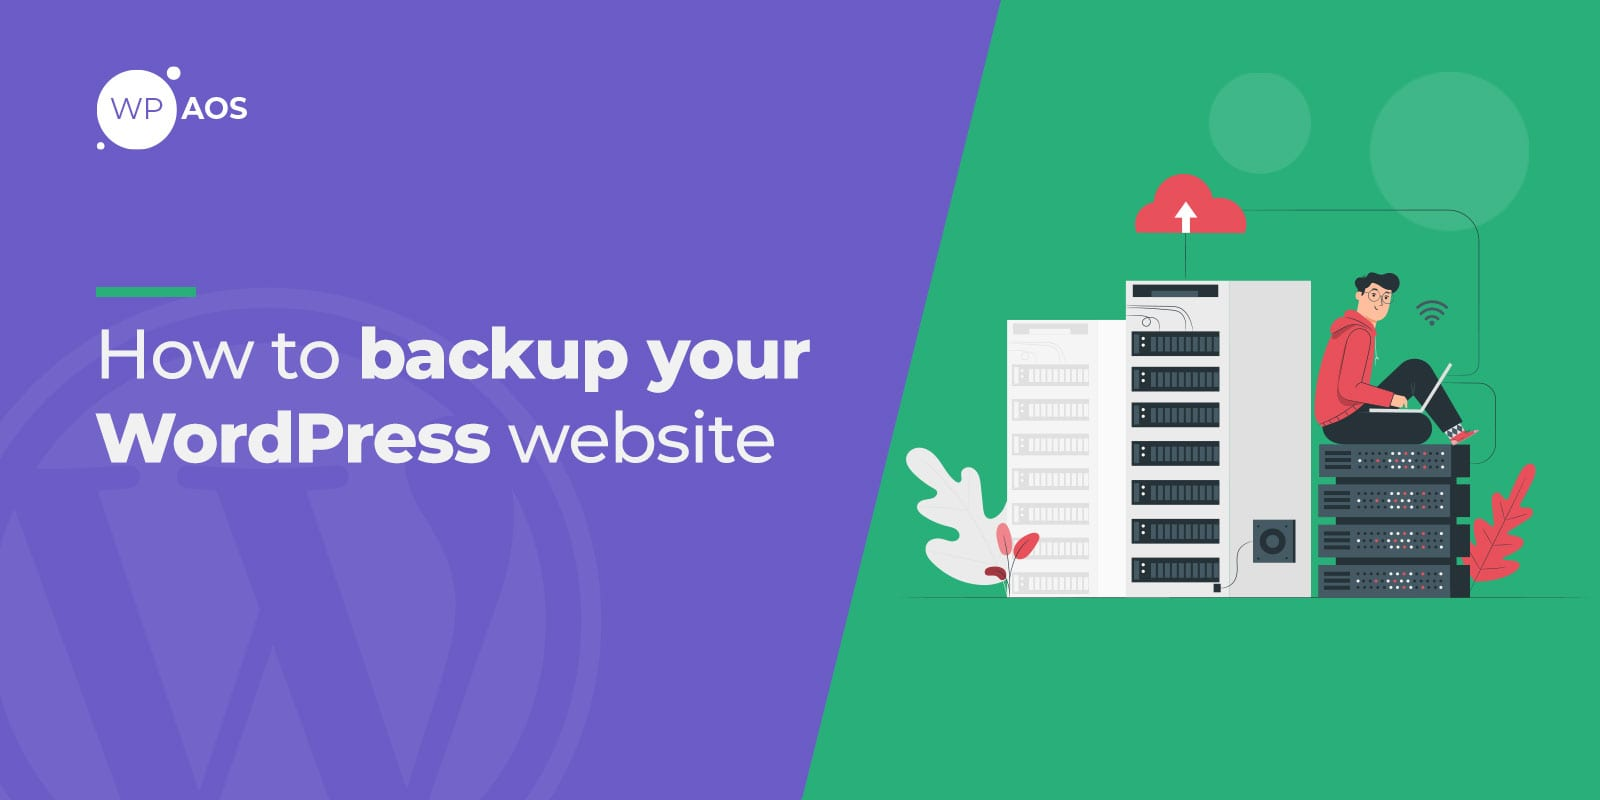 wordpress backup, website security, woocommerce maintenance, wpaos